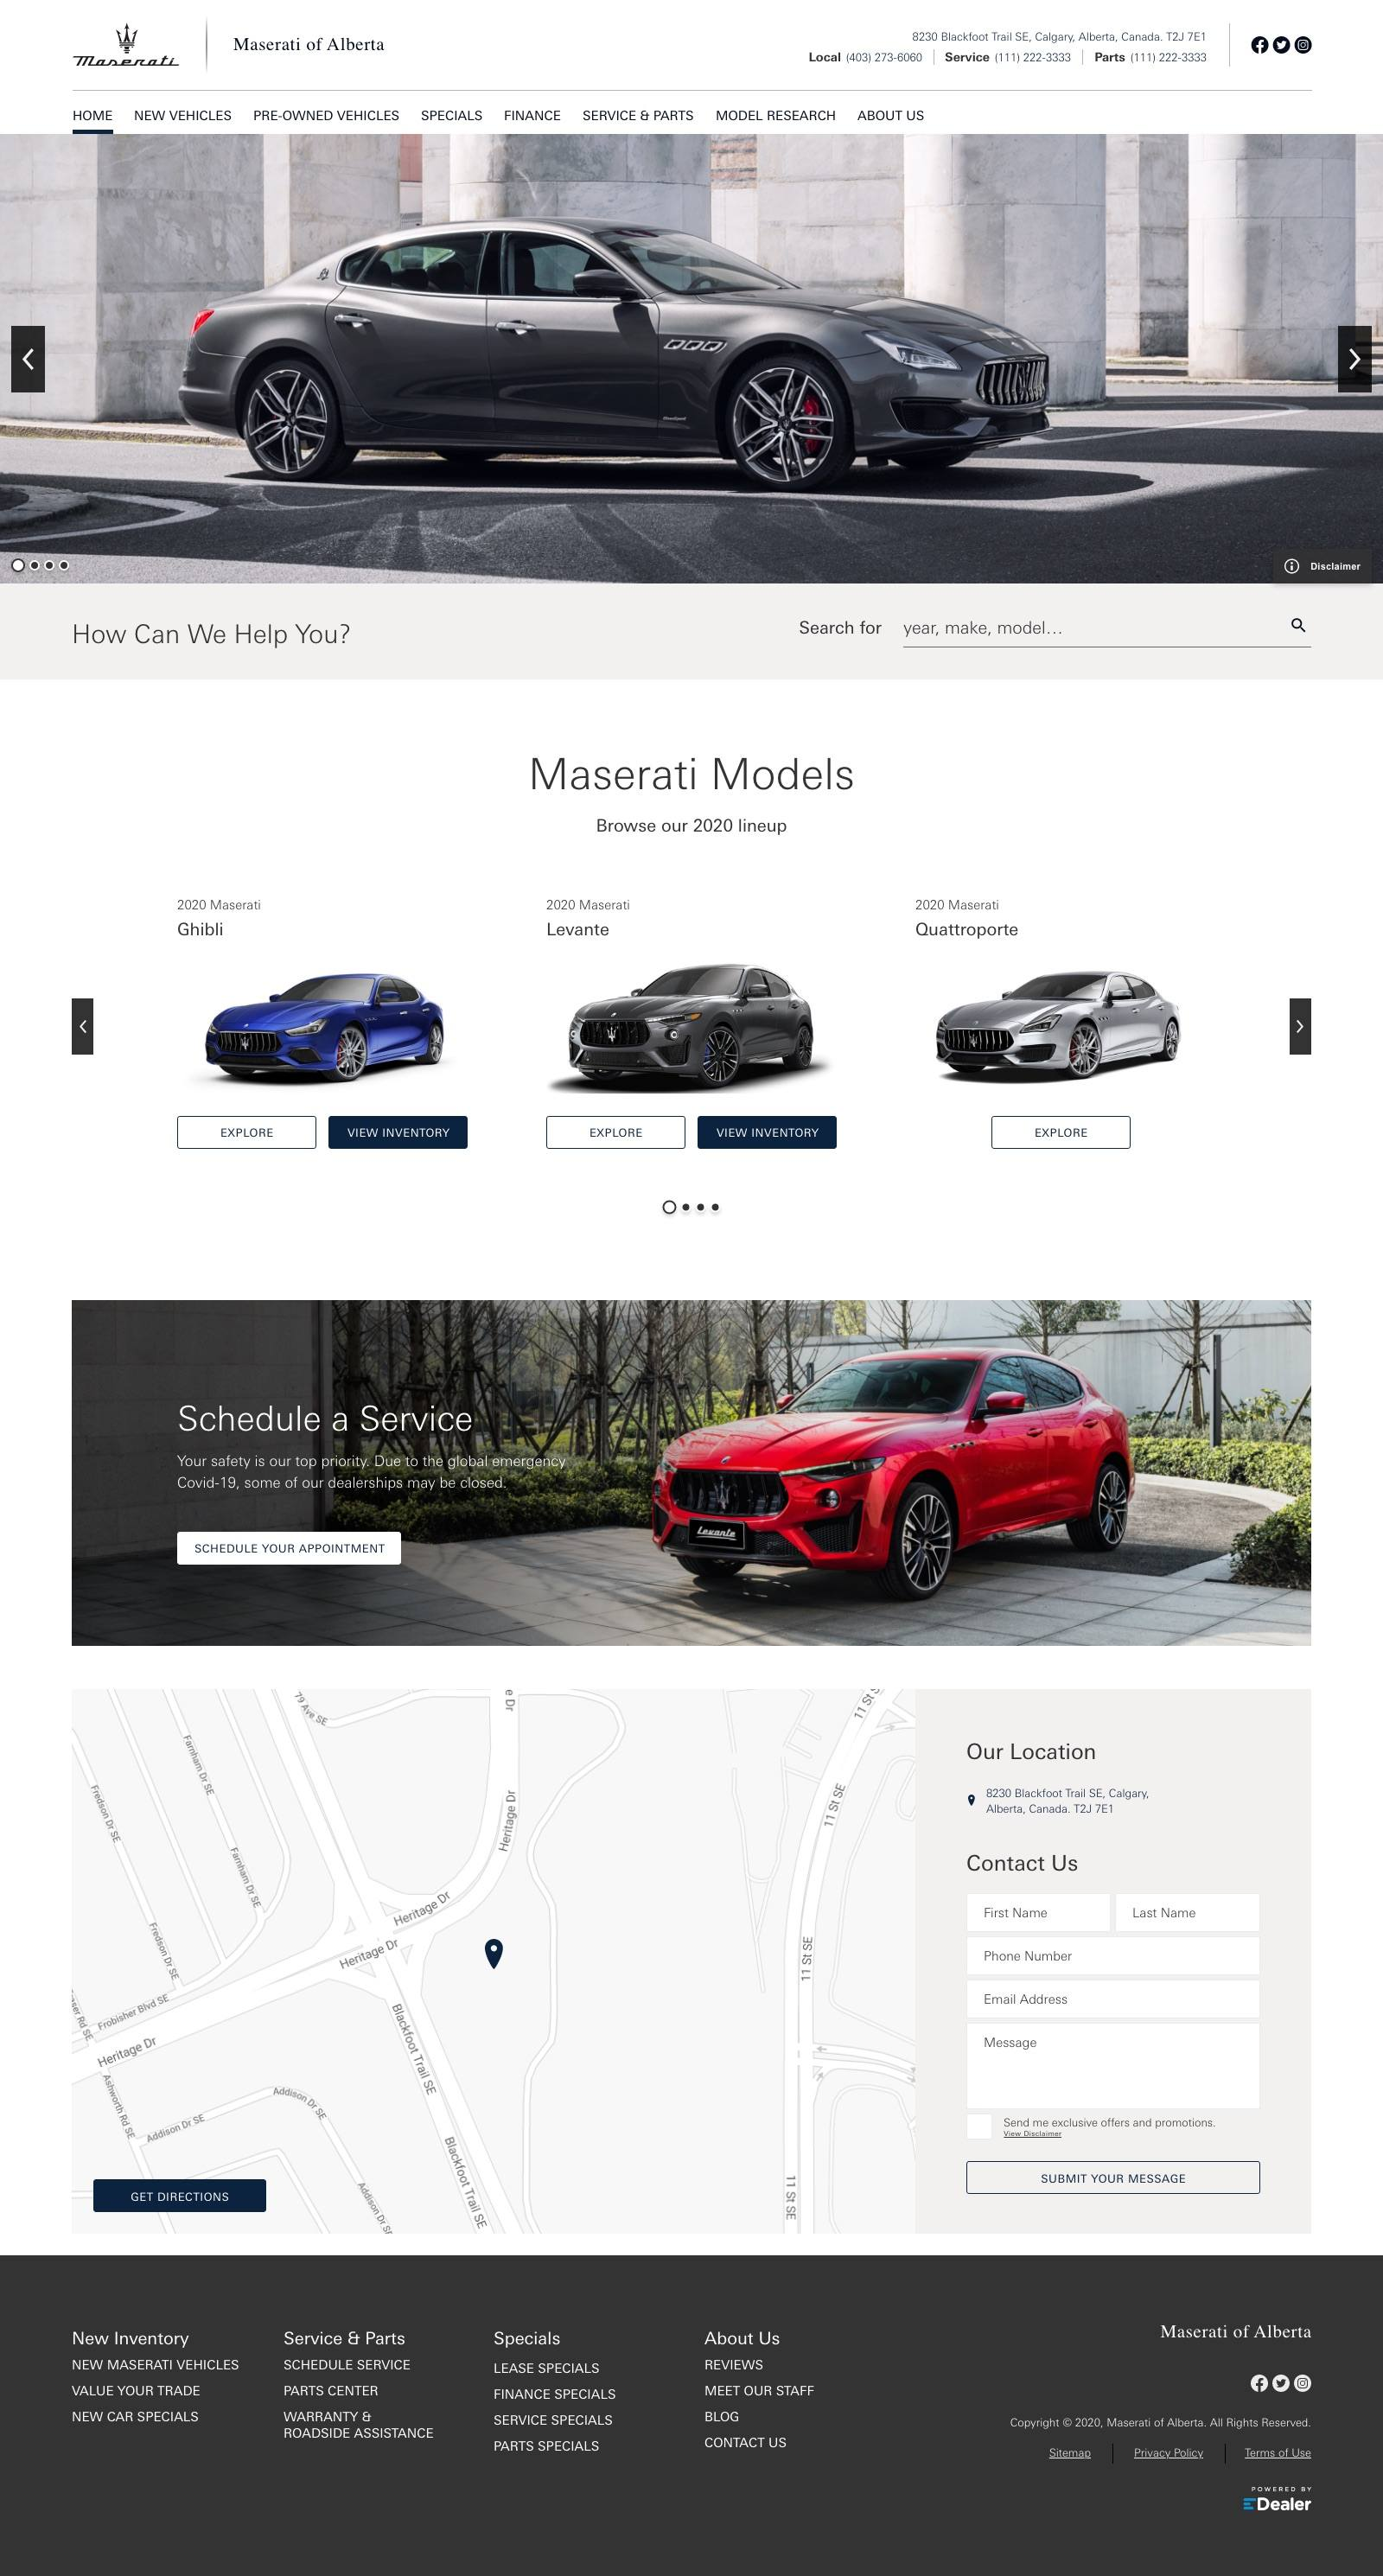 Maserati of Alberta